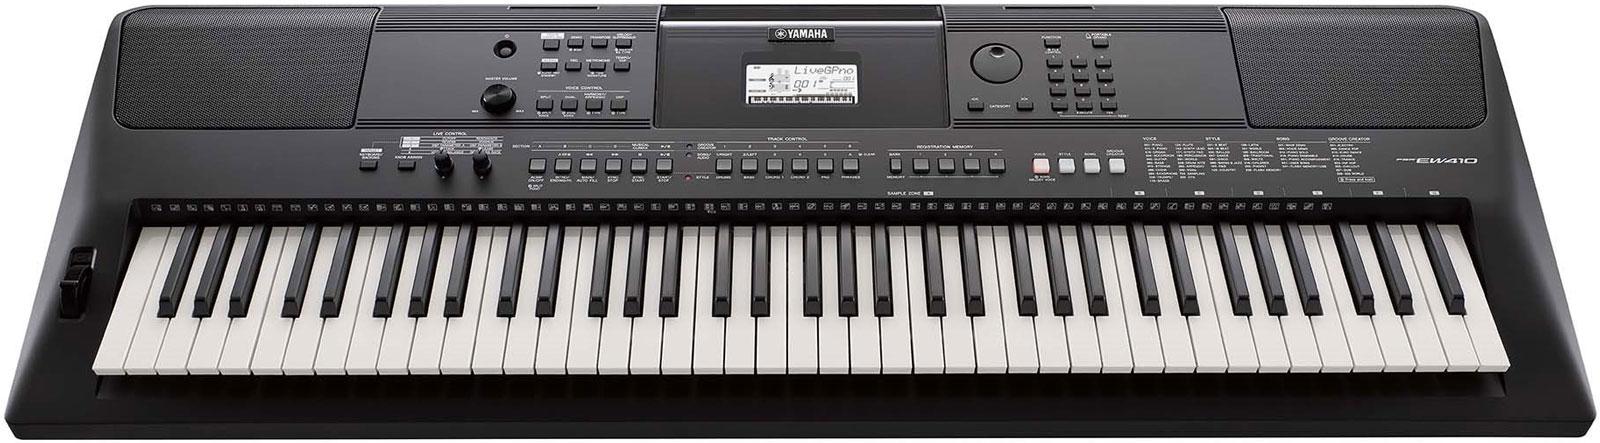 yamaha psr ew410 76 key portable keyboard music machine musical instruments nz guitars nz. Black Bedroom Furniture Sets. Home Design Ideas